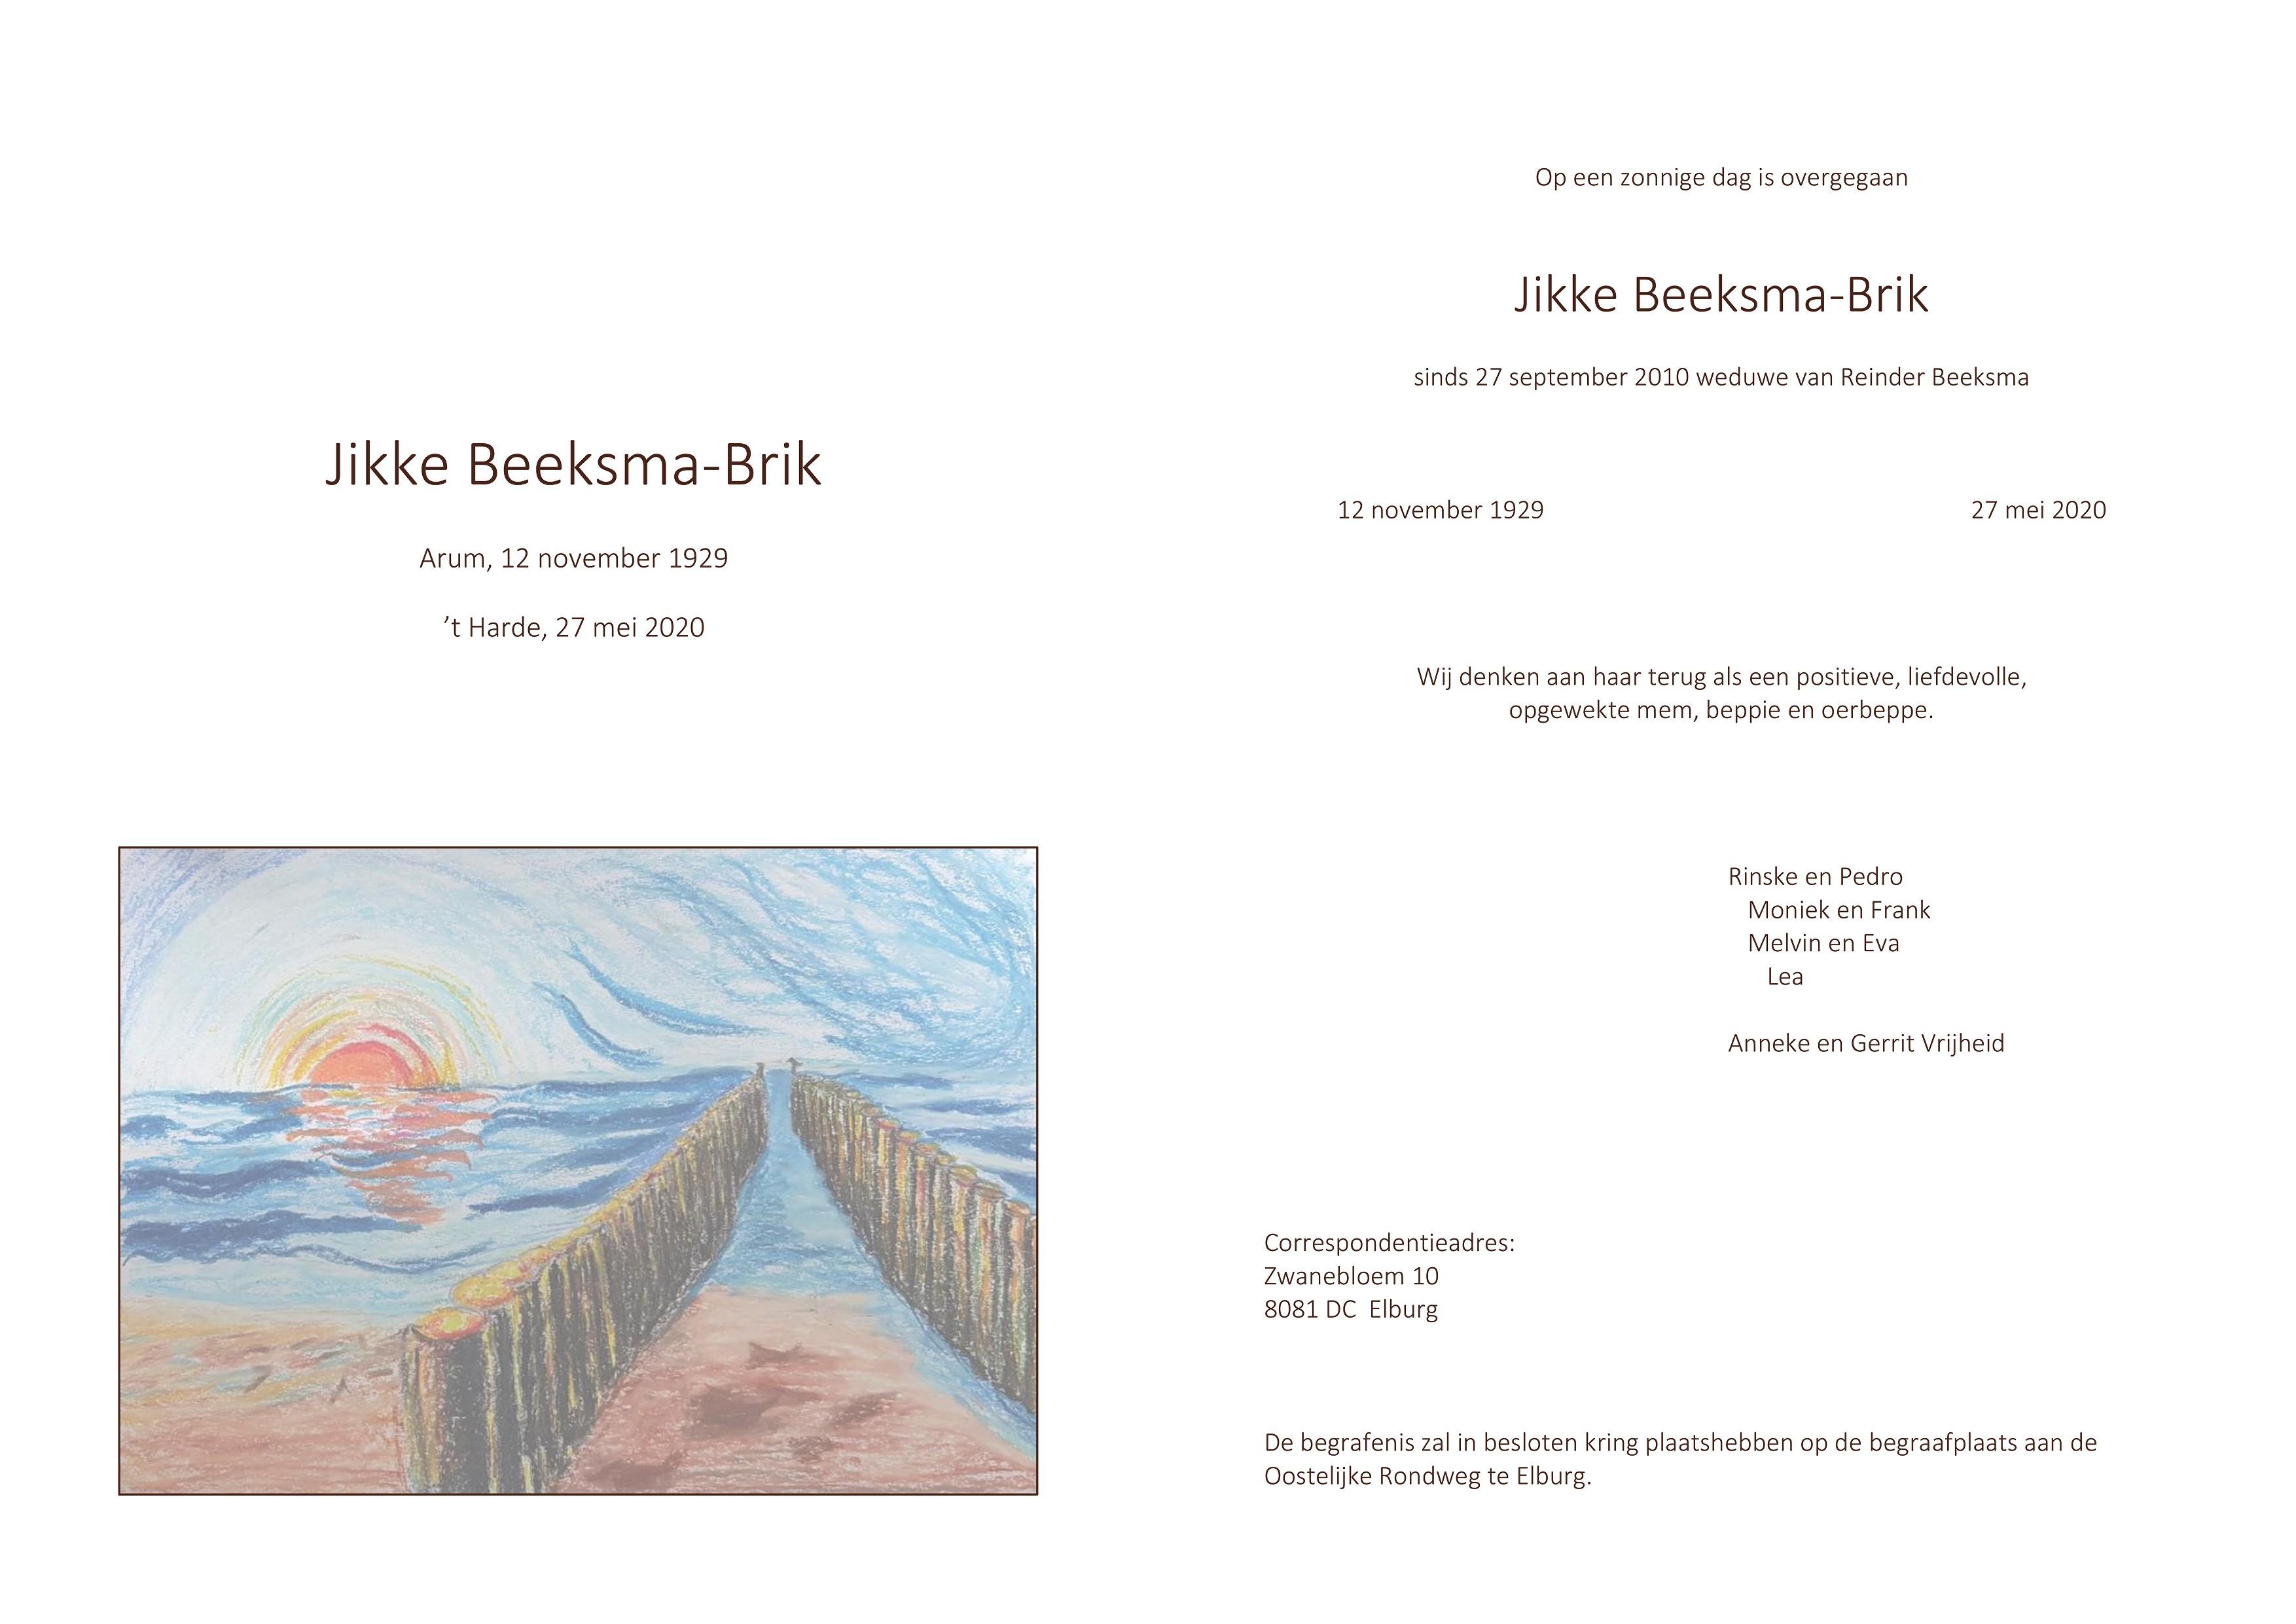 Jikke Beeksma-Brik Death notice